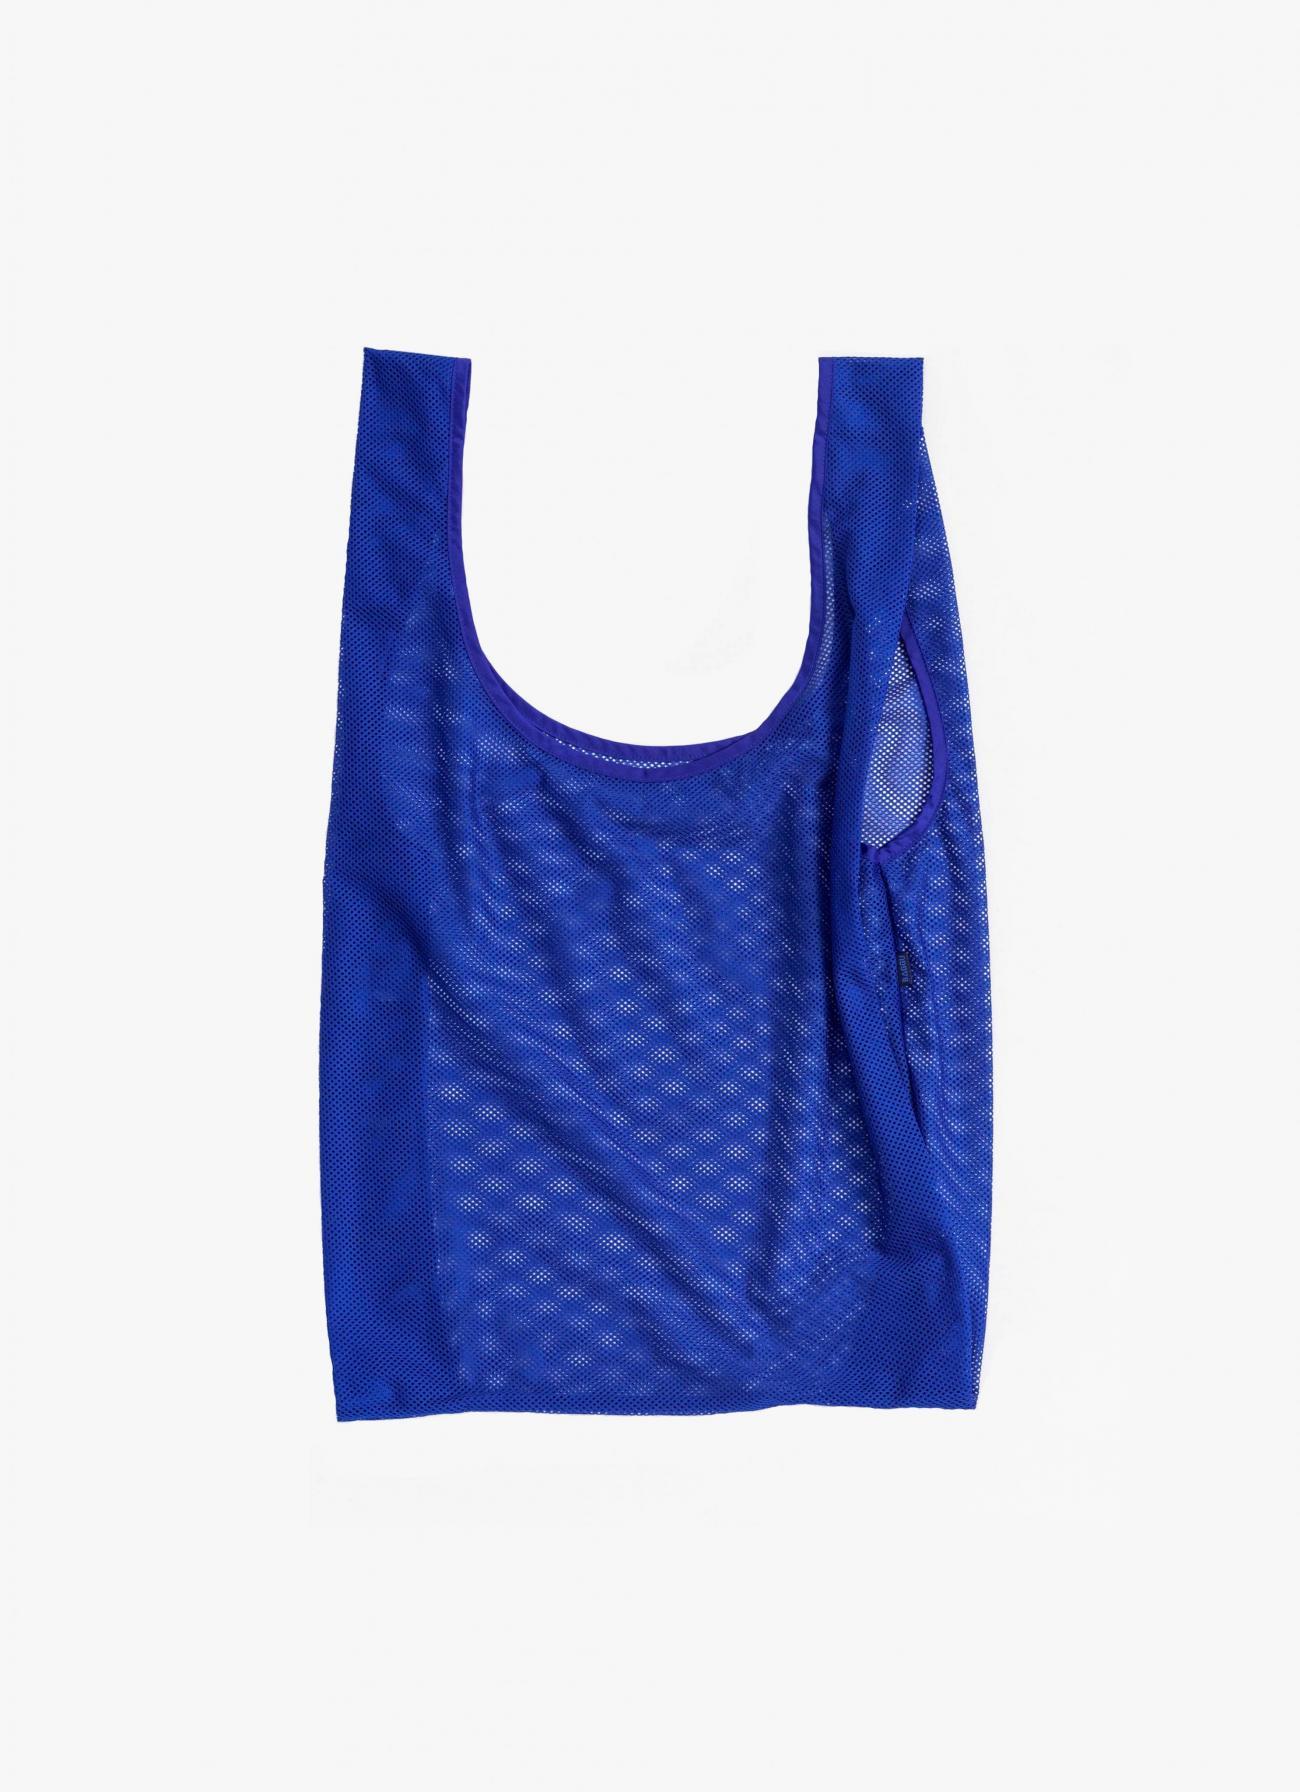 Baggu Mesh Reusable Shopping Bag - Cobalt